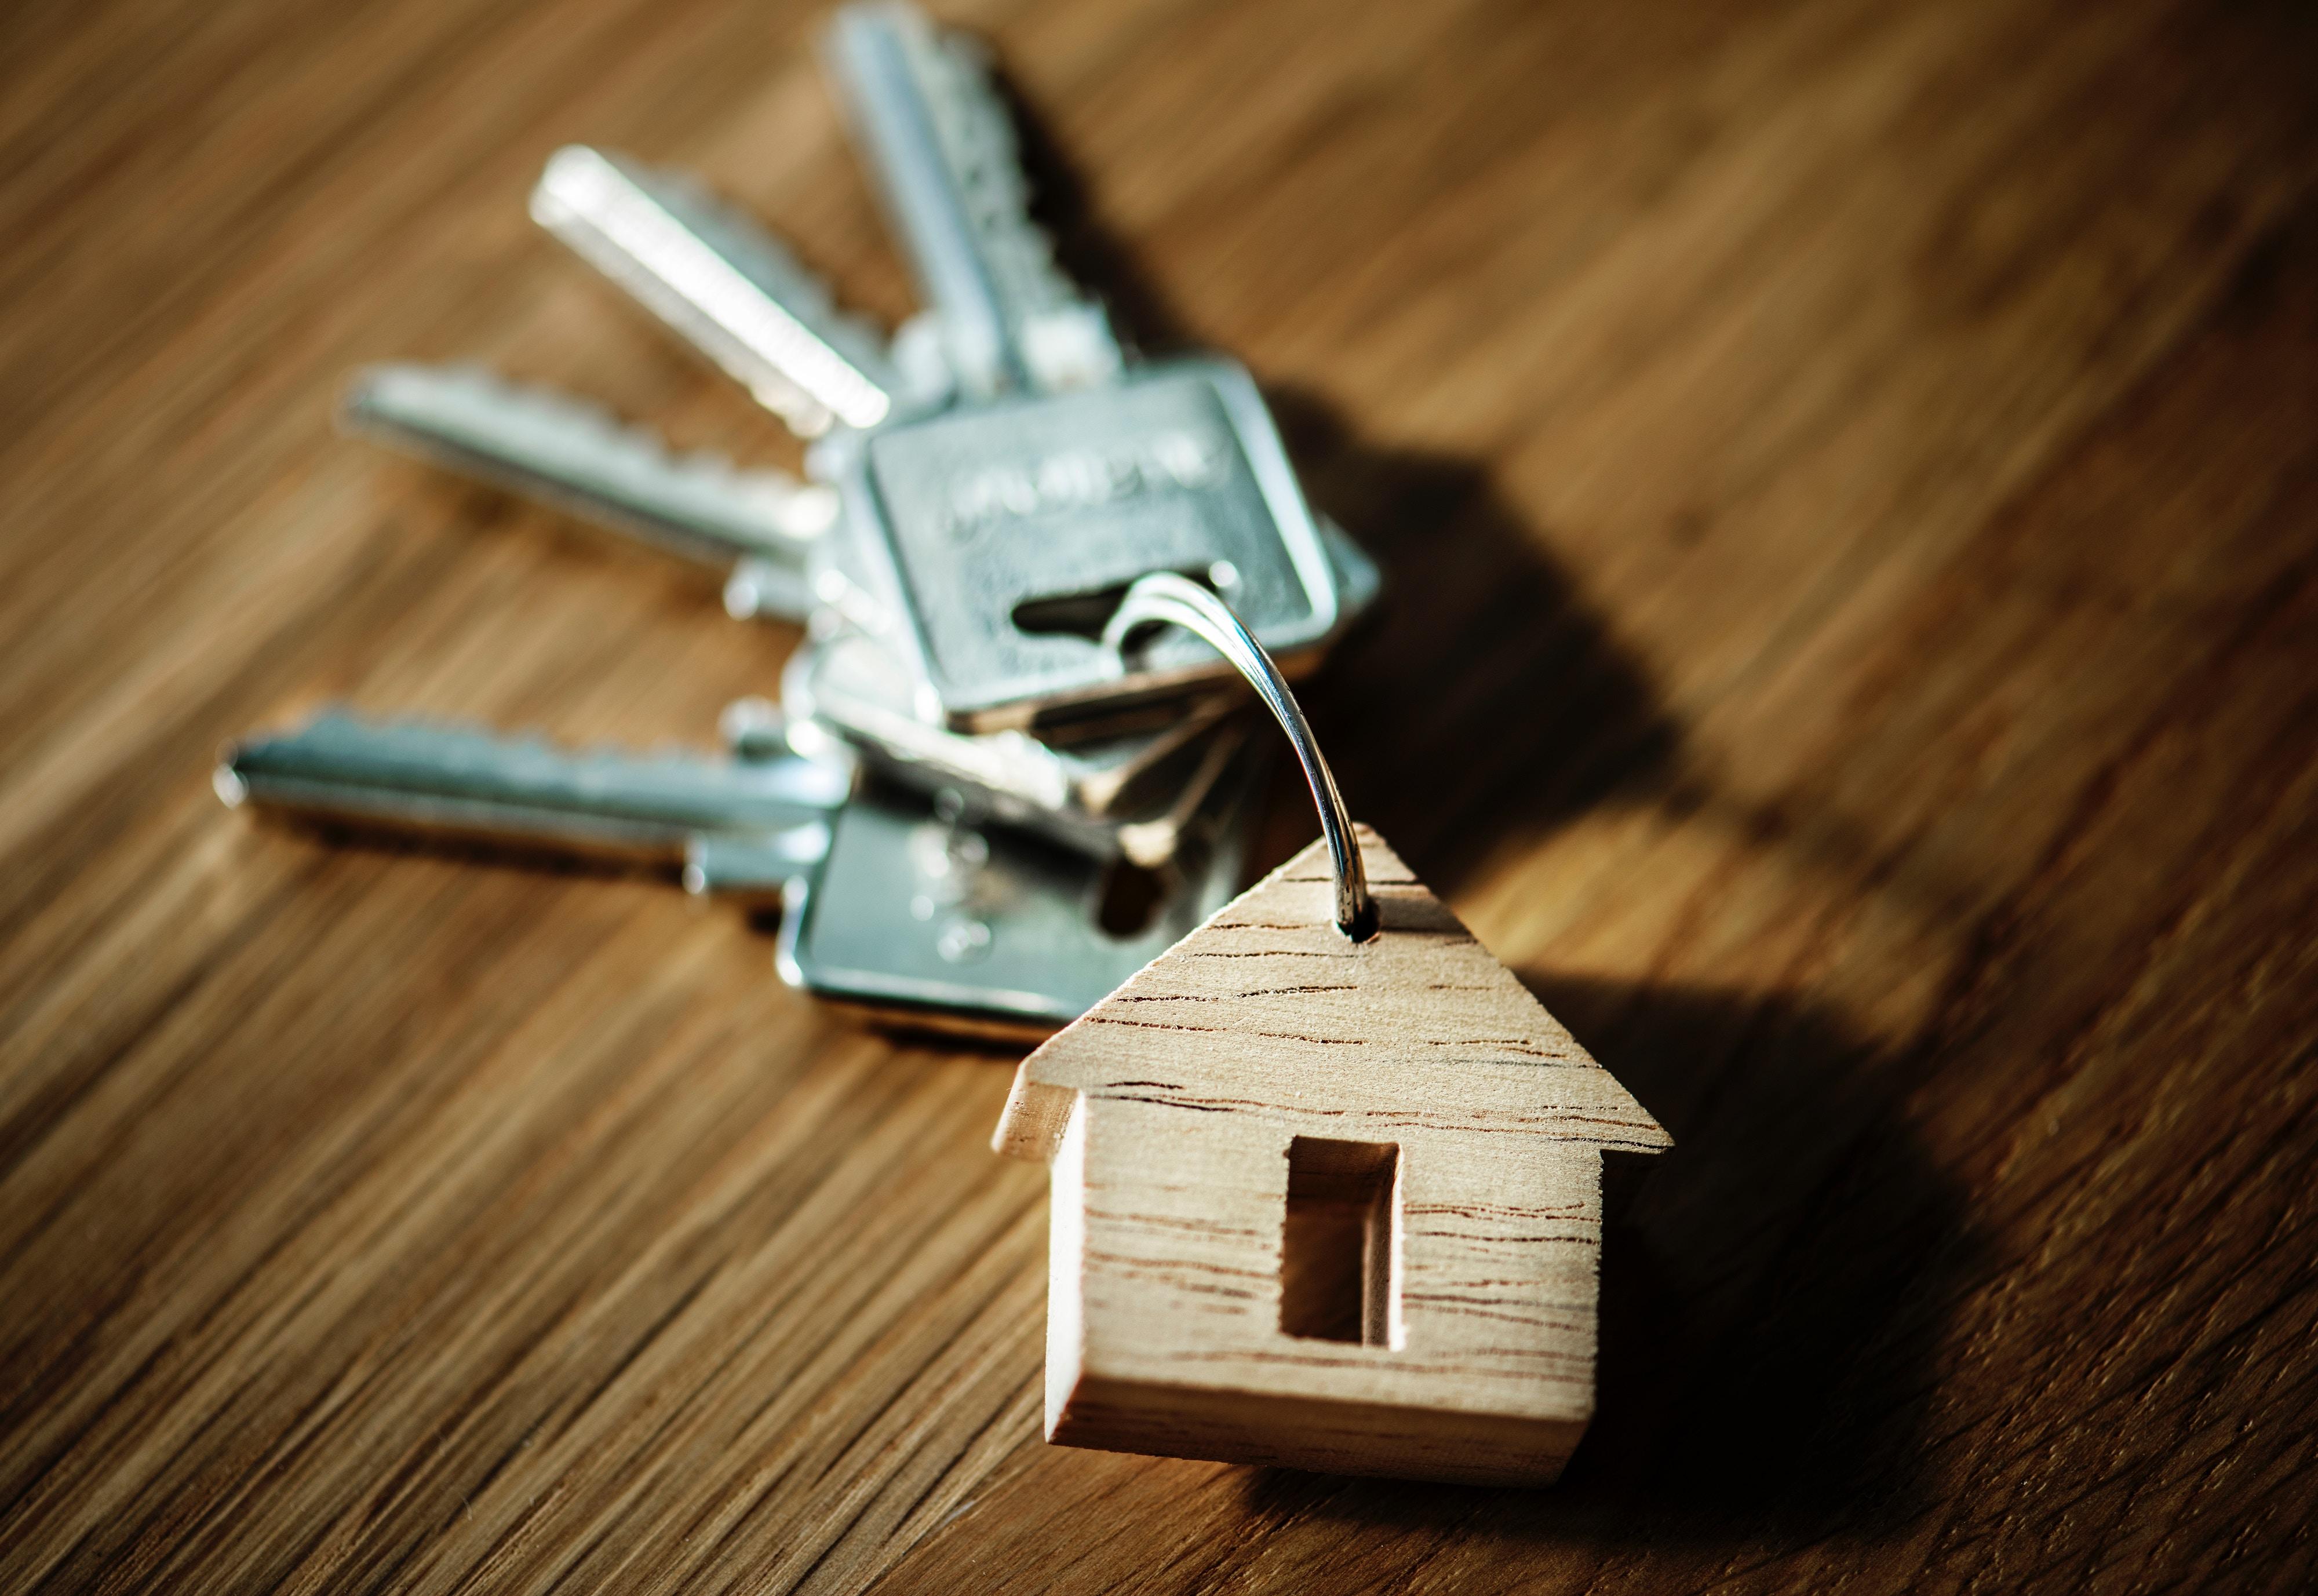 3. Homebuyer Education